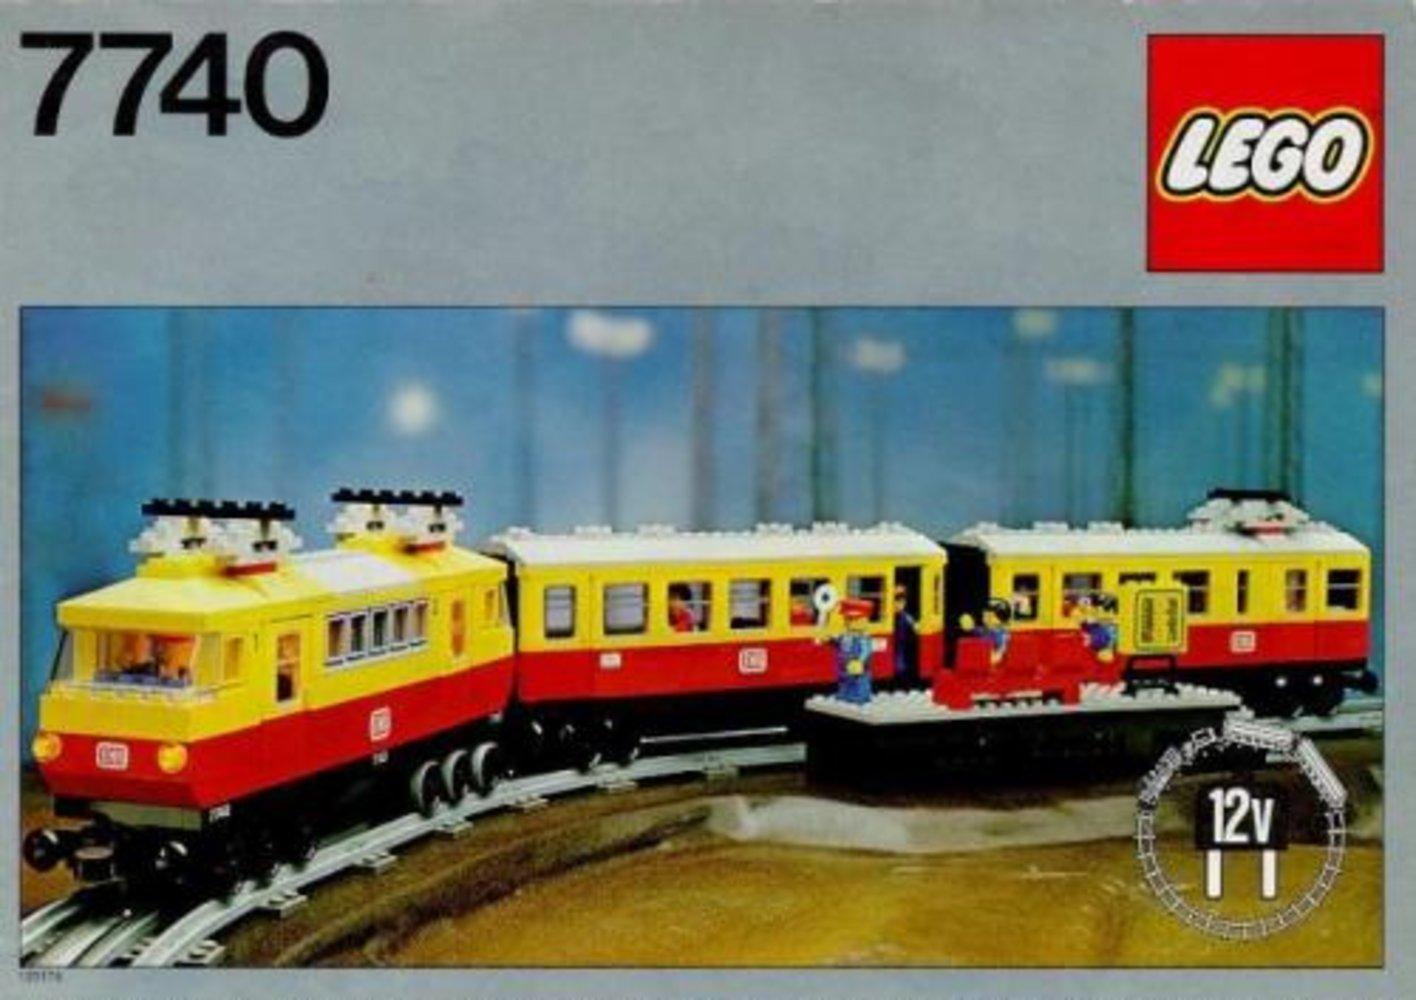 Inter-City Passenger Train